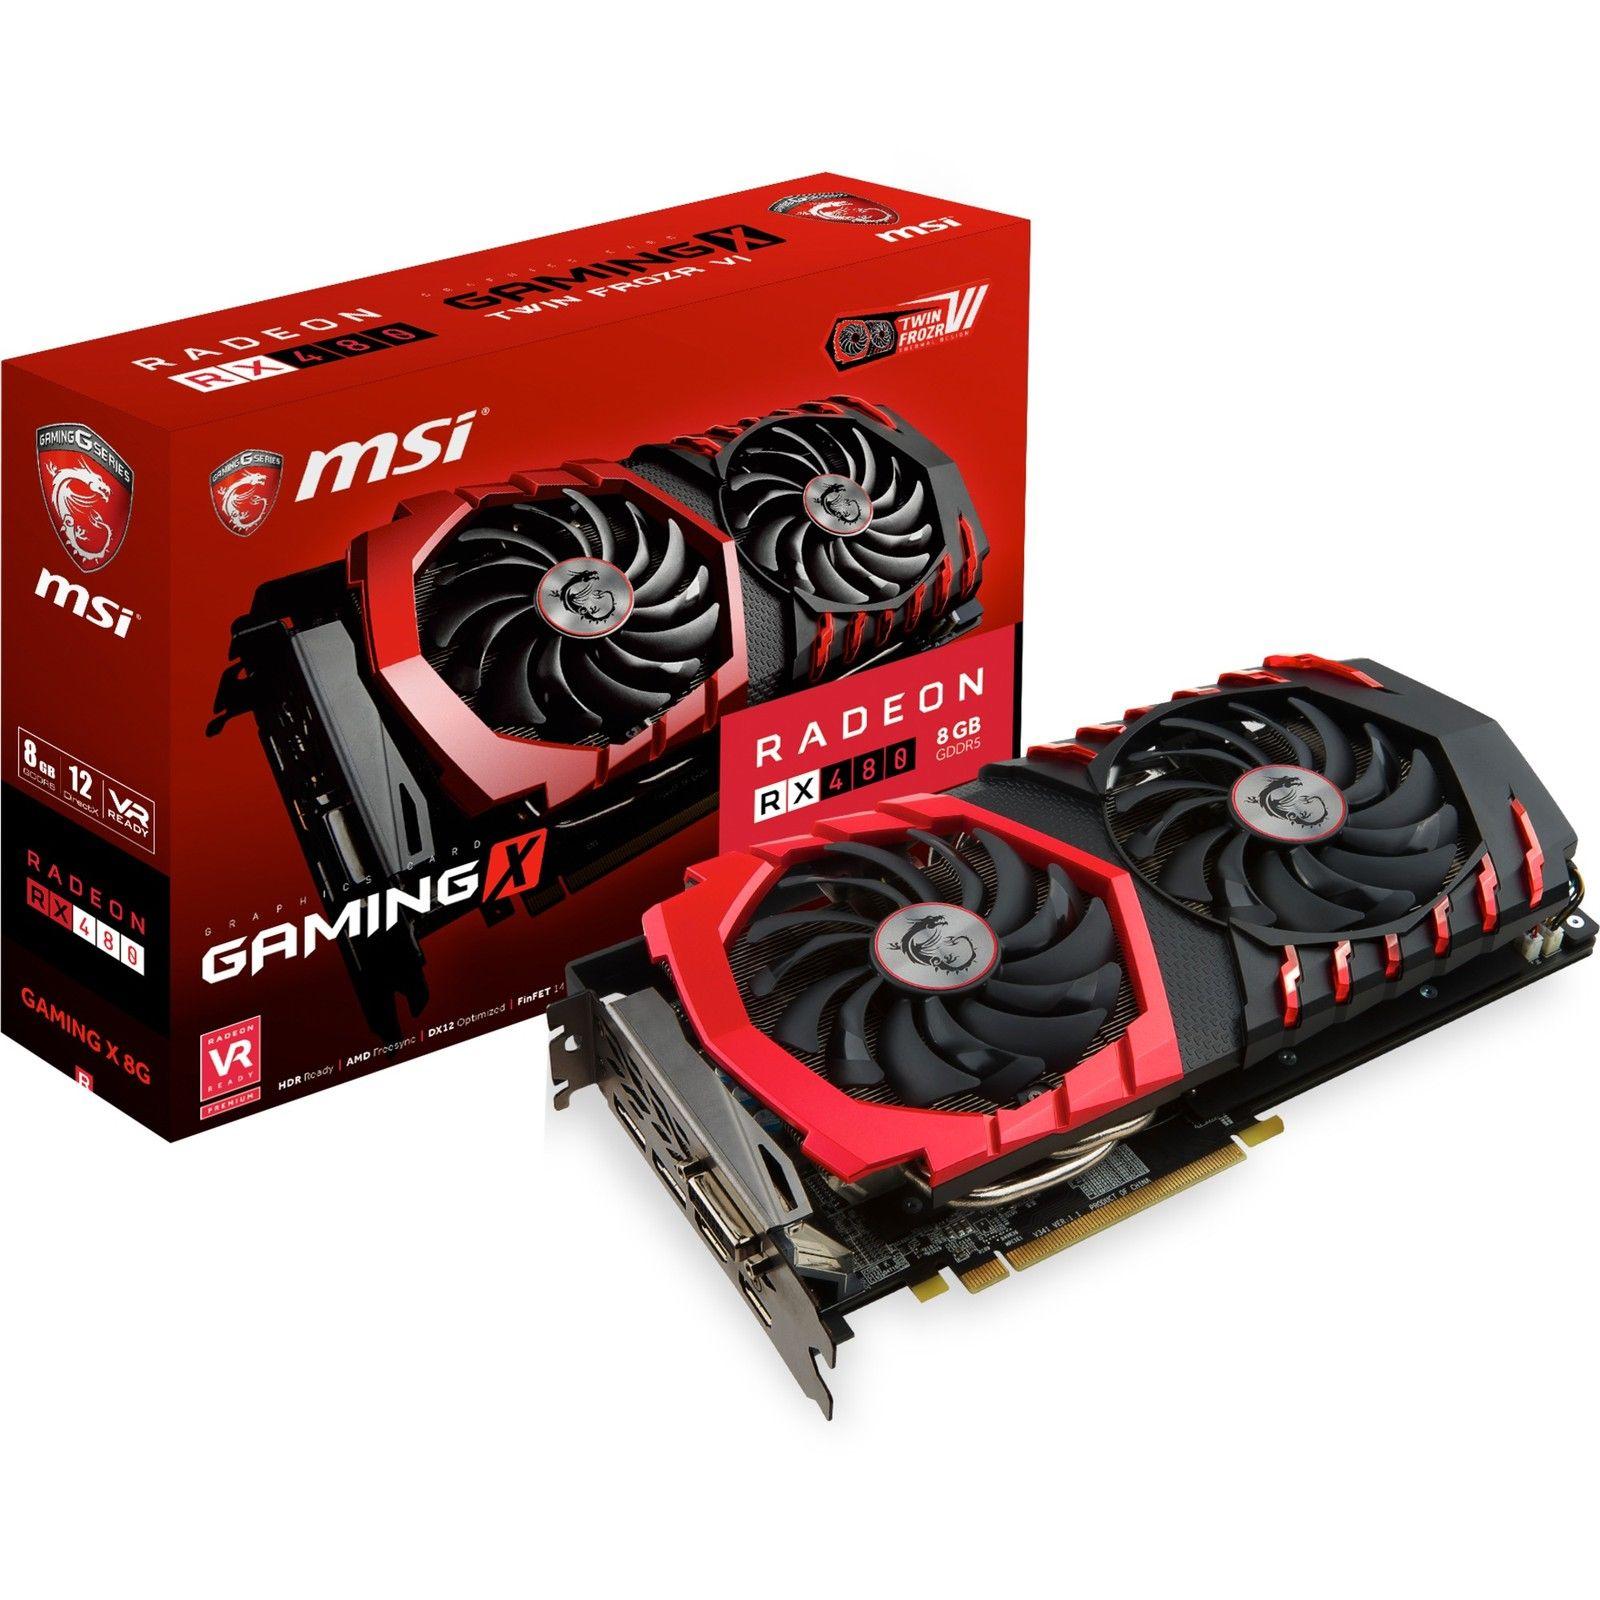 MSI Radeon RX 480 Gaming X 8G, Grafikkarte